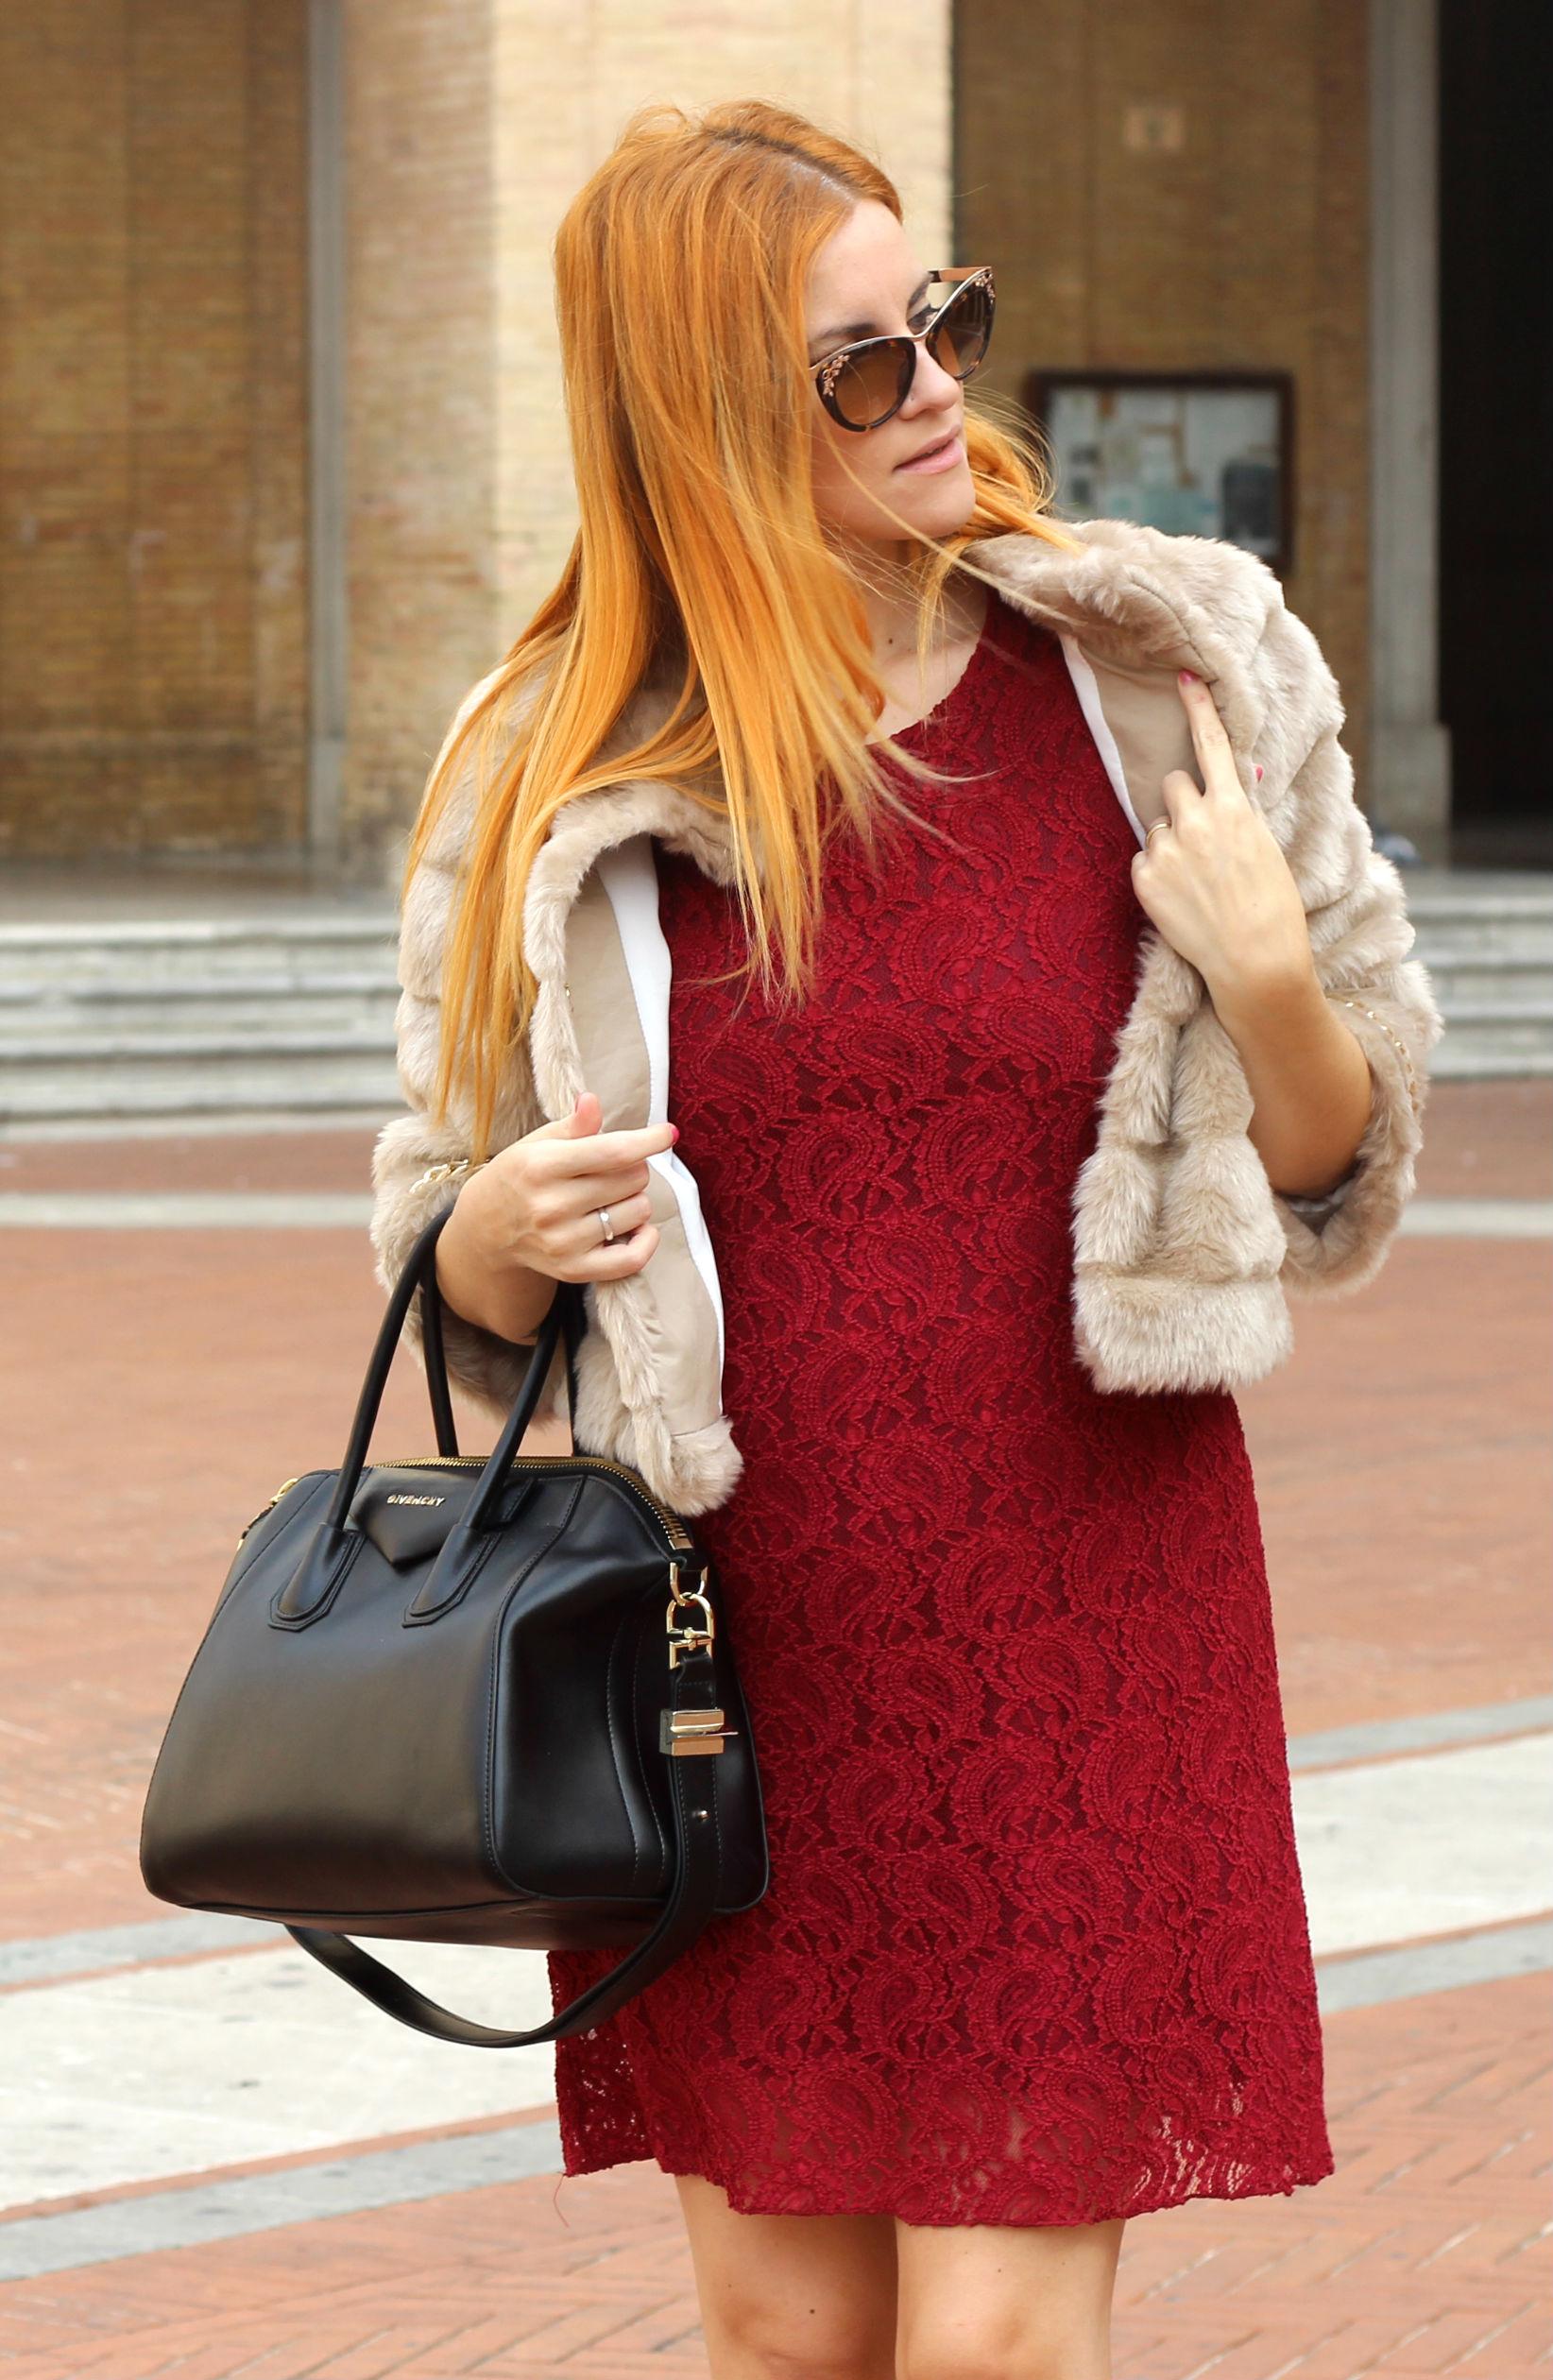 abbigliamento donna abito indeependent made in italy